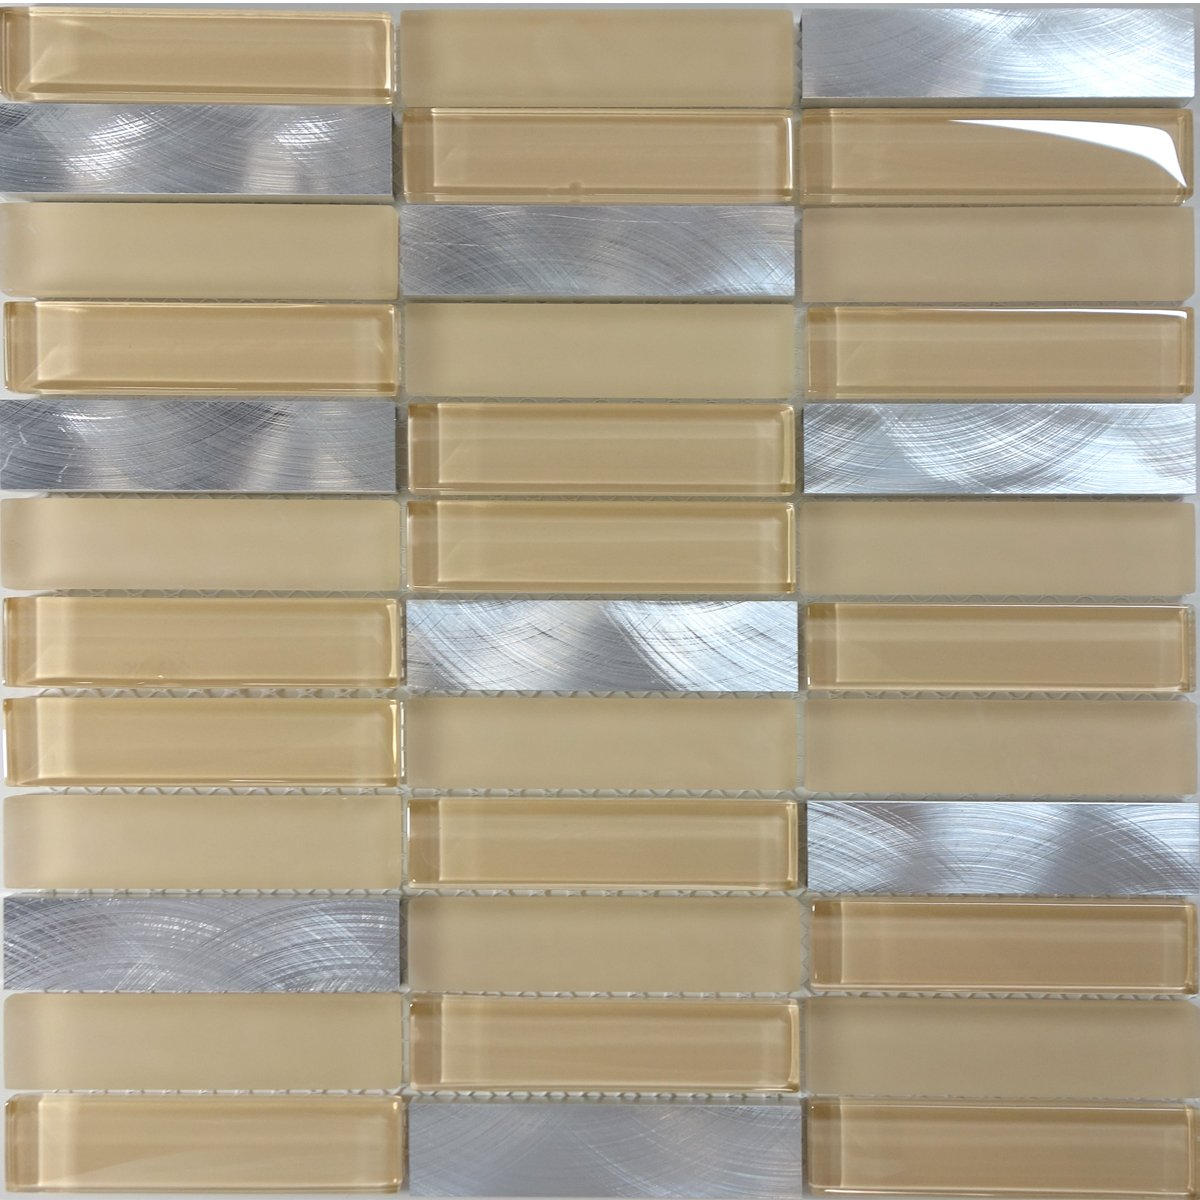 Modket TDH222MO Modern Cream Beige Crystal Glass Blended Metallic Aluminum and Matted Glass Mosaic Tile Backsplash